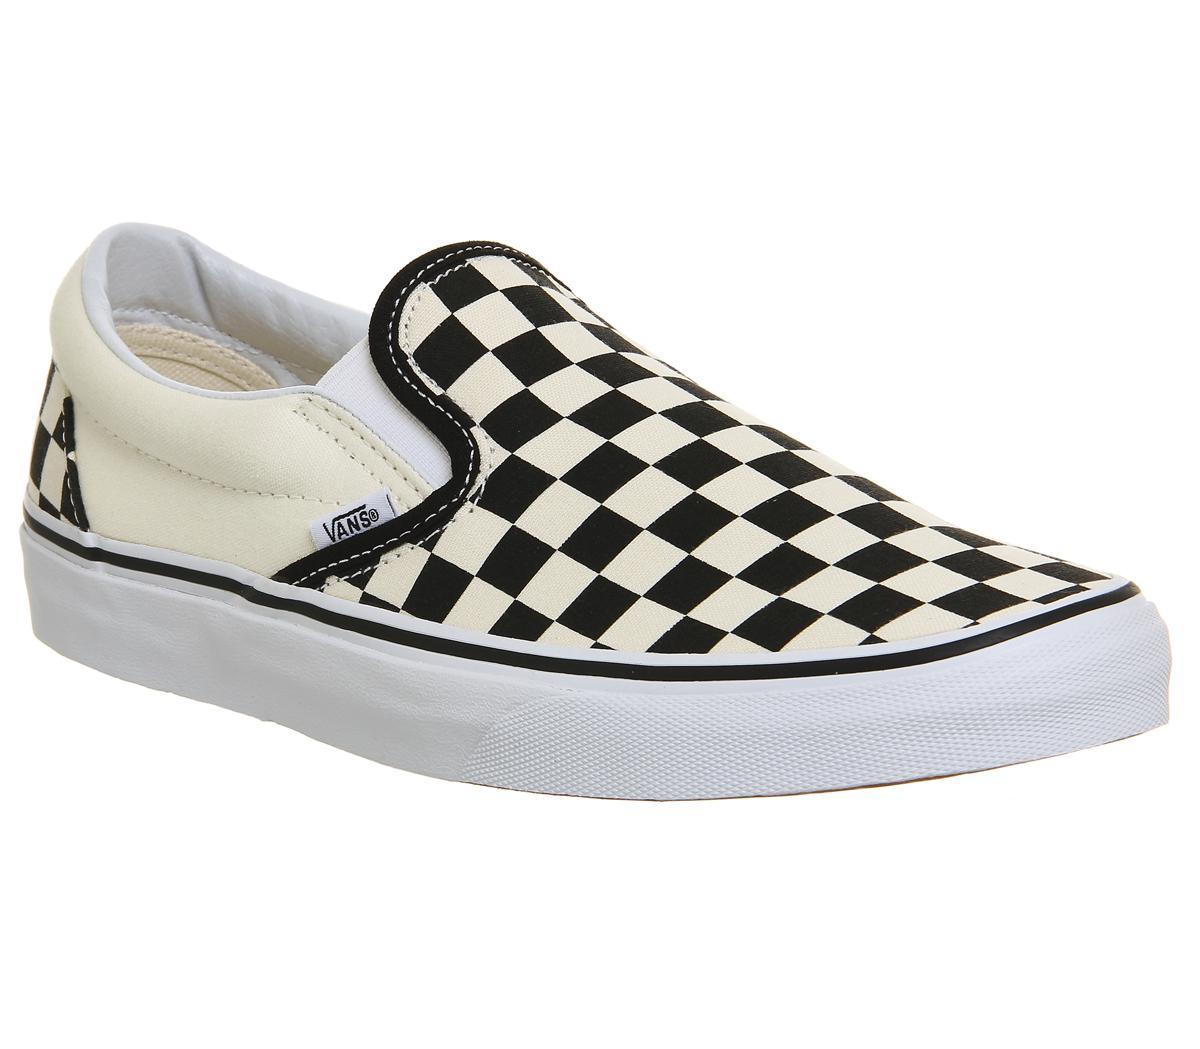 vans chaussures maidstone